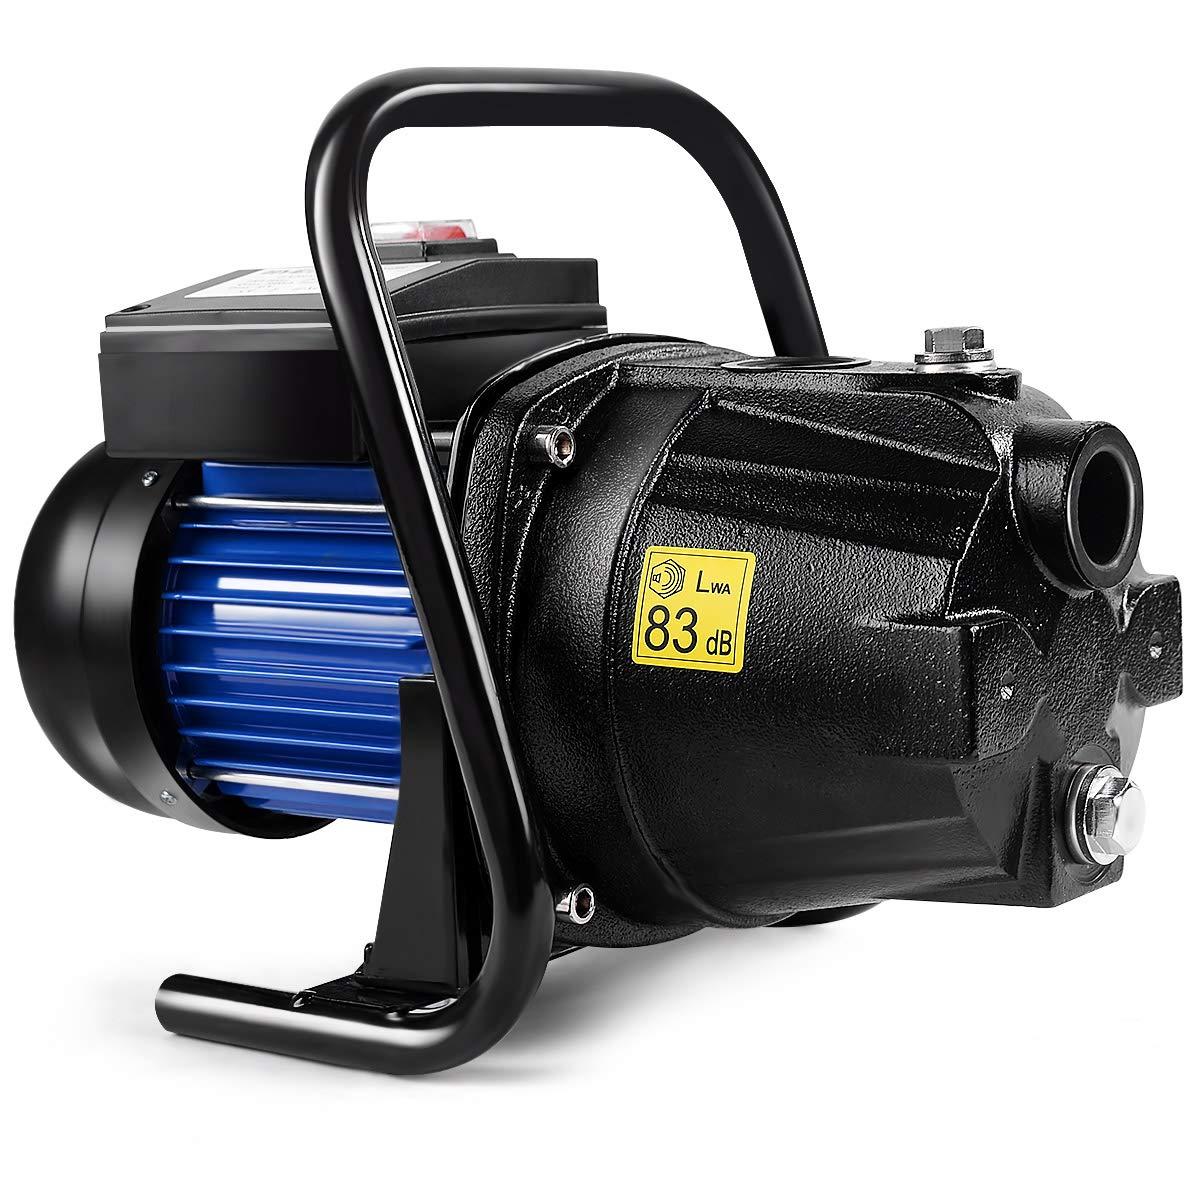 Goplus 1.6HP Well Water Pump Home Garden Irrigation Booster Jet Pump 1000GPH, 1200W (Black)